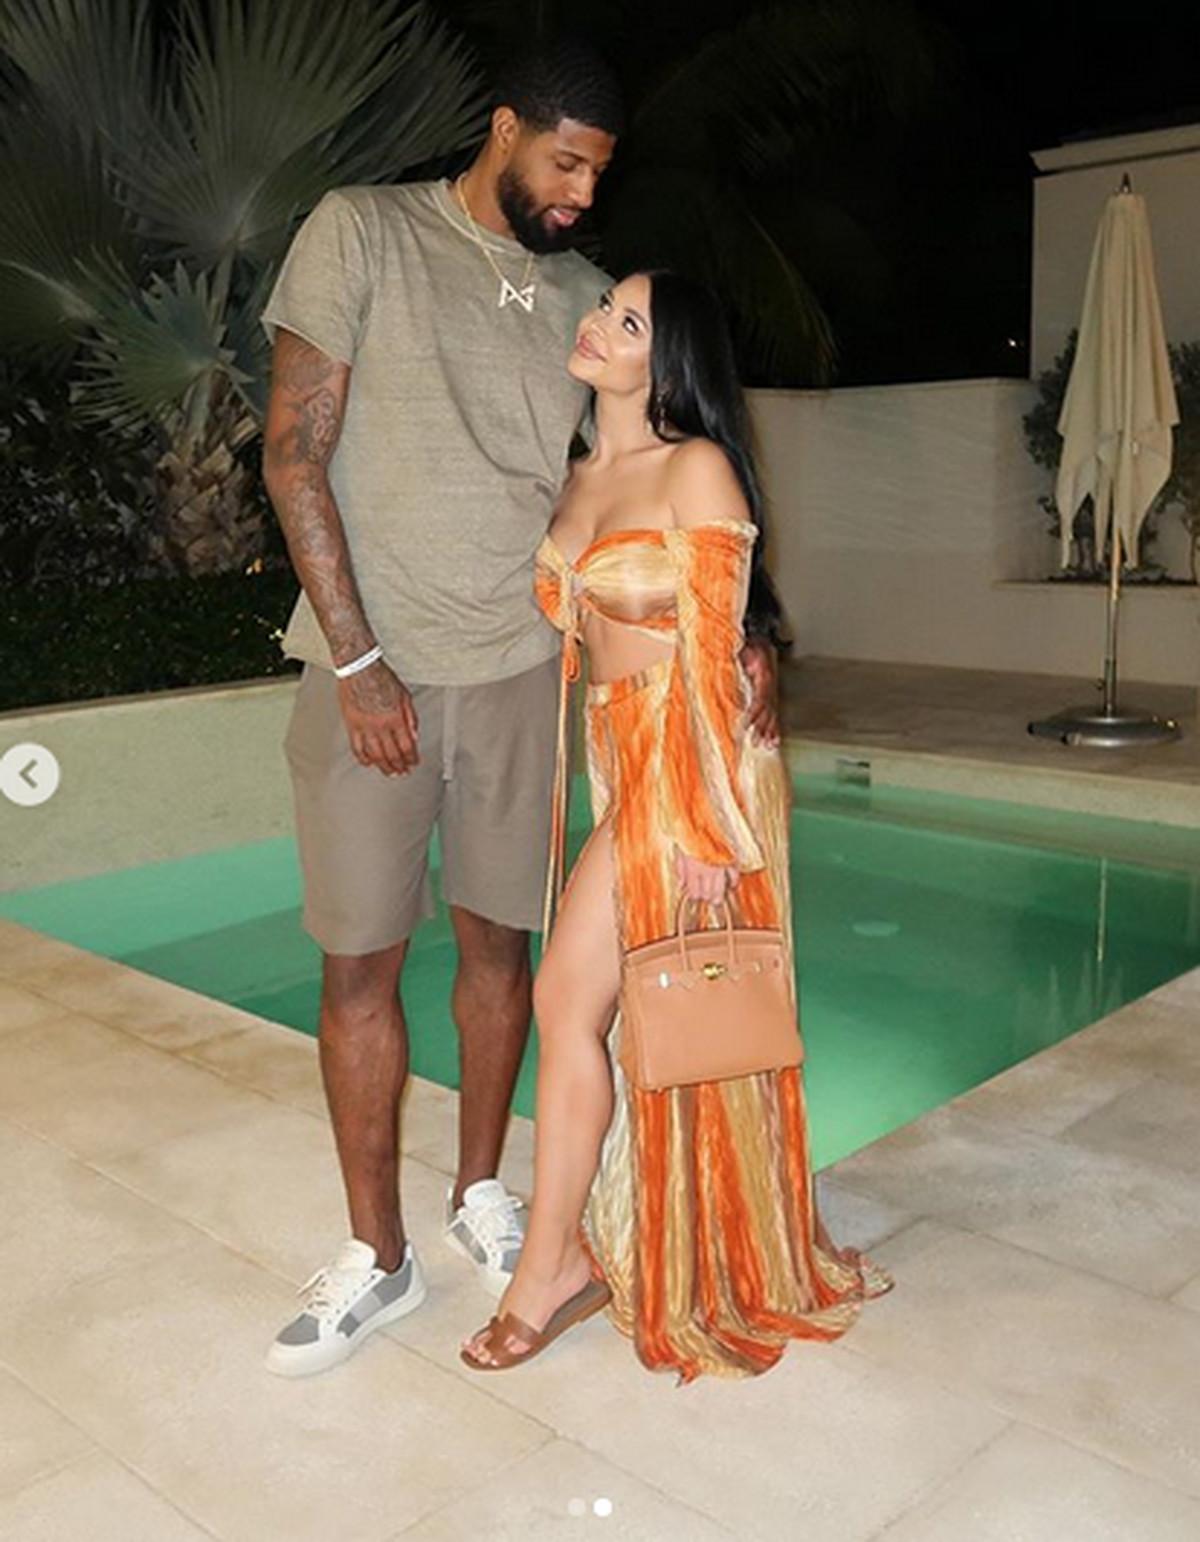 UDAJE SE SRPSKA KIM KARDAŠIJAN! NBA zvezda je zaprosila na DIRLJIV način, upoznala ga je na jahti na kojoj je radila kao STRIPTIZETA, on joj nudio MILIONE da abortira, a danas planiraju svadbu! /VIDEO/